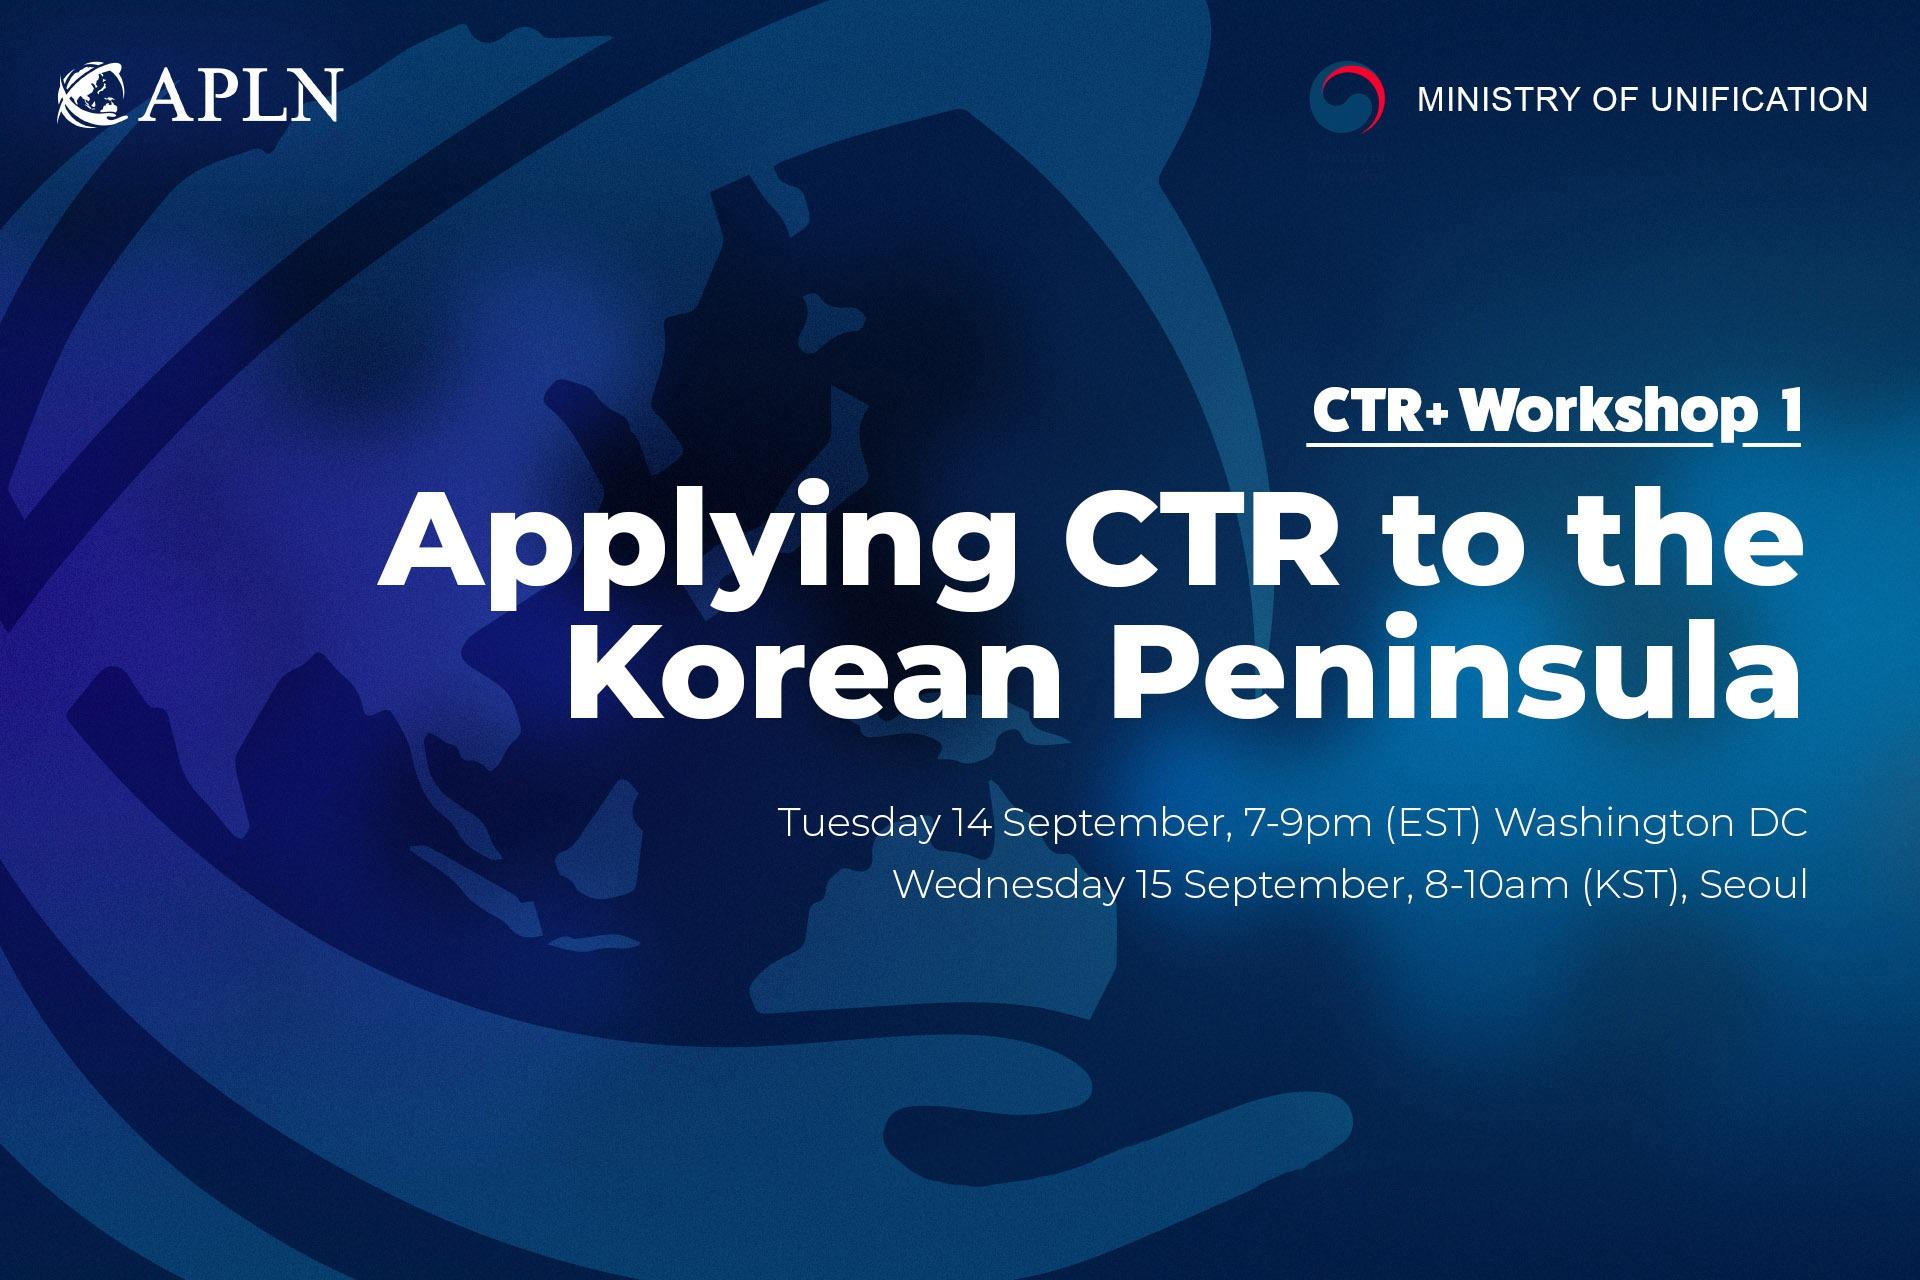 [Webinar 1] Applying CTR to the Korean Peninsula